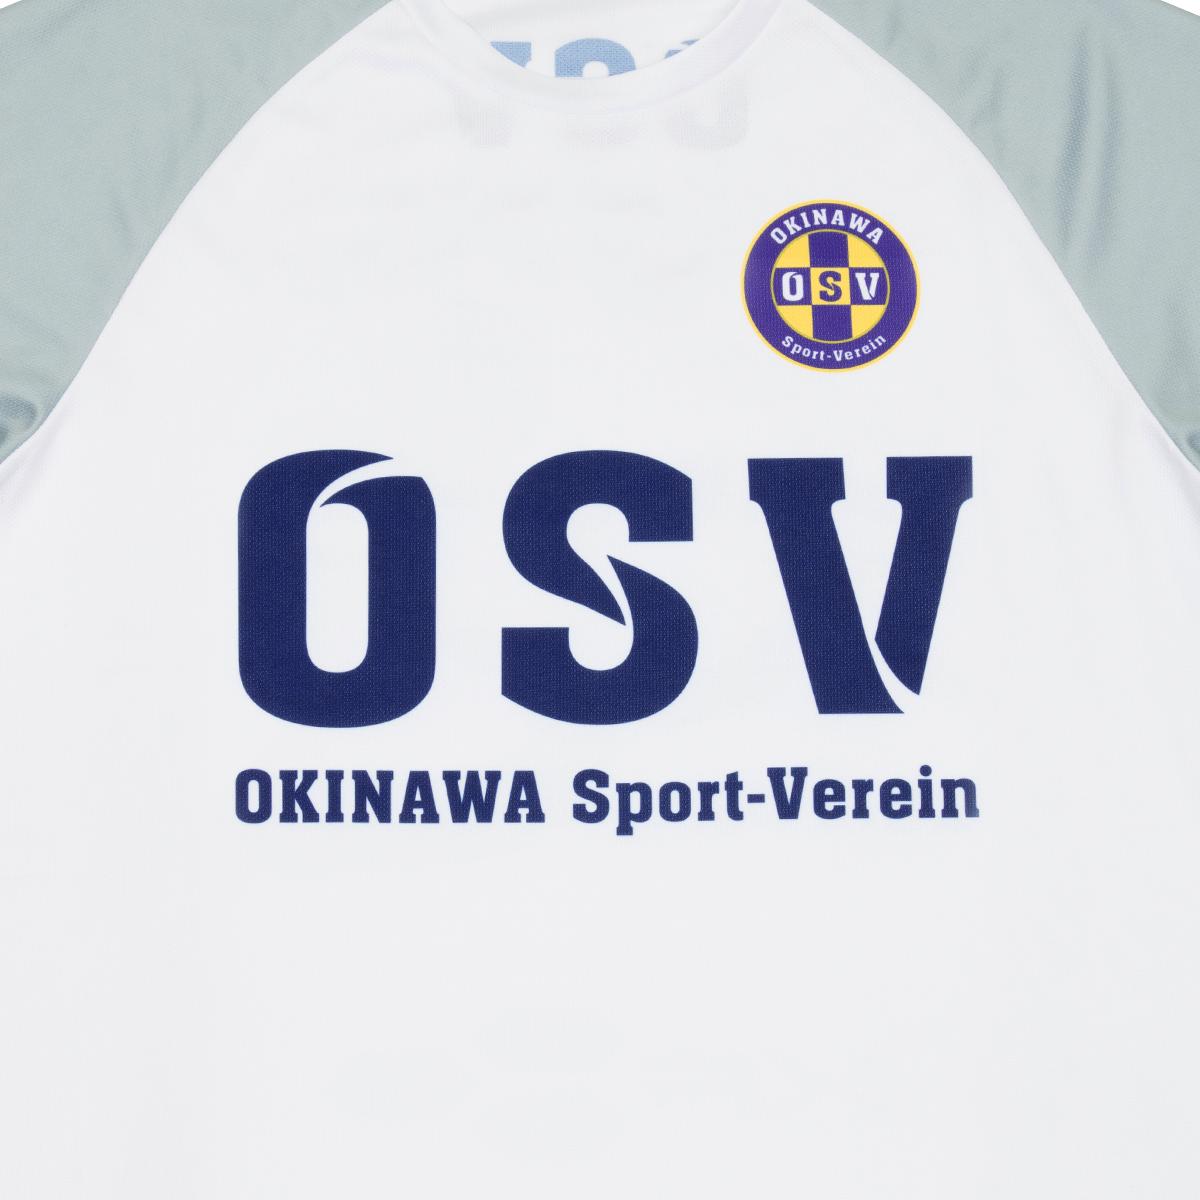 <img class='new_mark_img1' src='https://img.shop-pro.jp/img/new/icons8.gif' style='border:none;display:inline;margin:0px;padding:0px;width:auto;' />沖縄SV ドライ スローガンTシャツ ホワイト